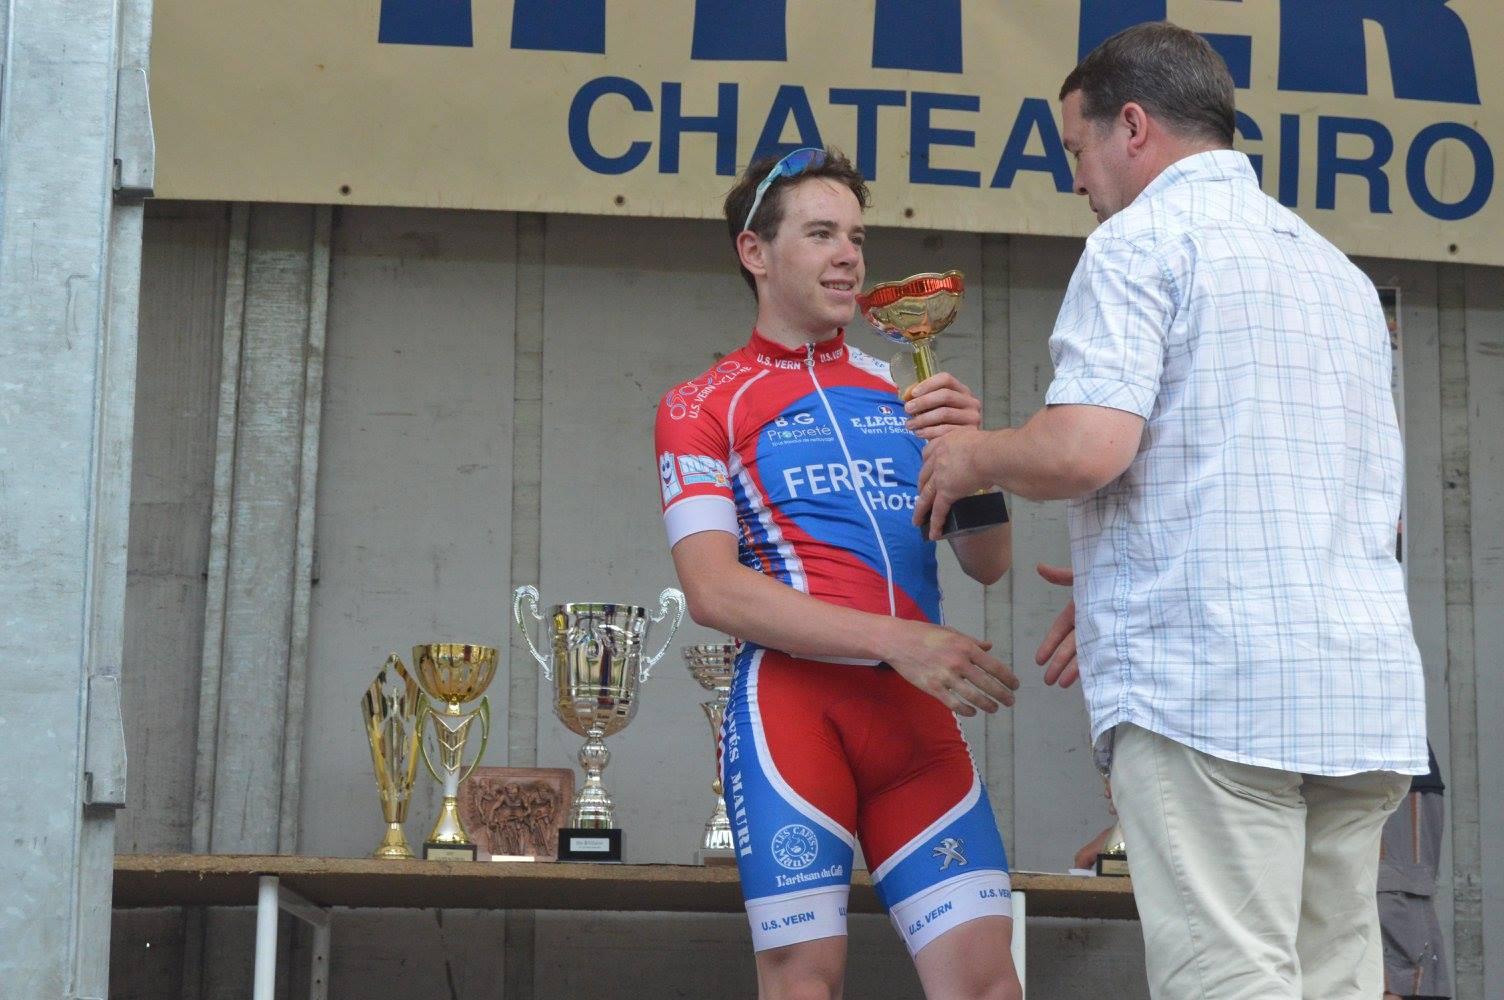 Alan Chevillard